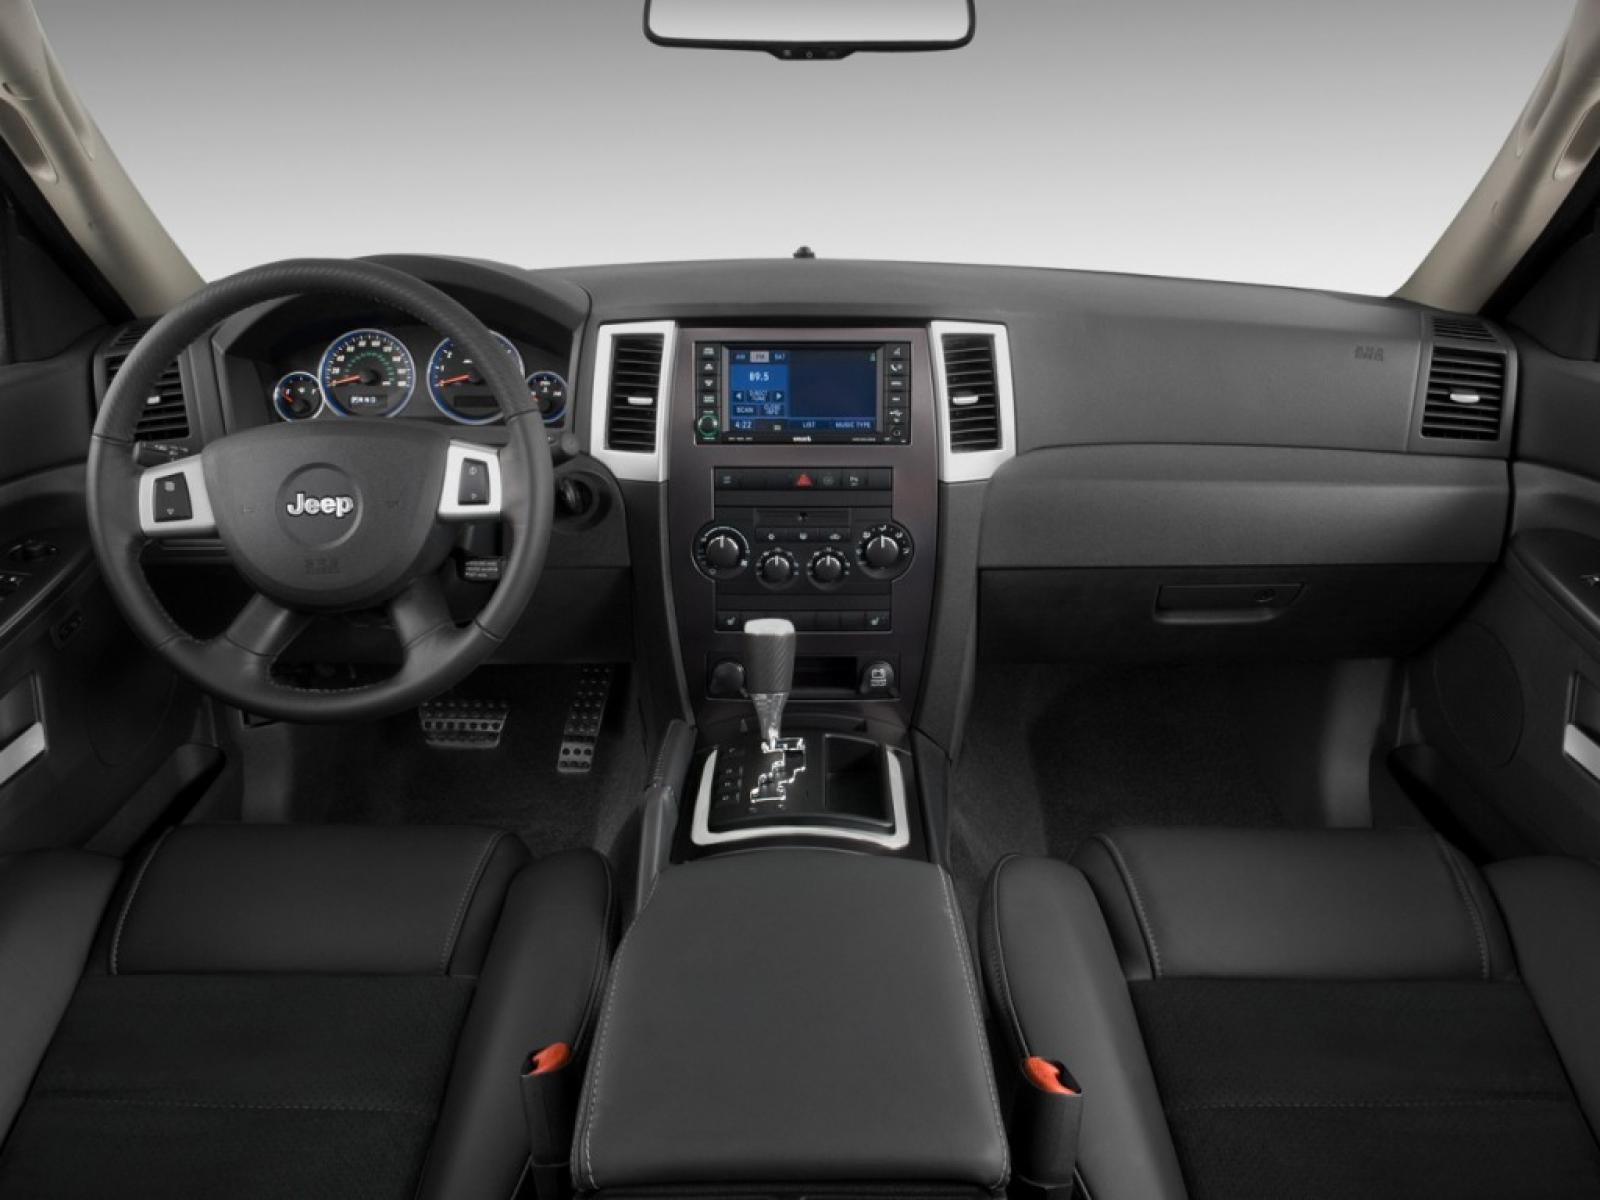 2009 Jeep Grand Cherokee Information And Photos Zomb Drive